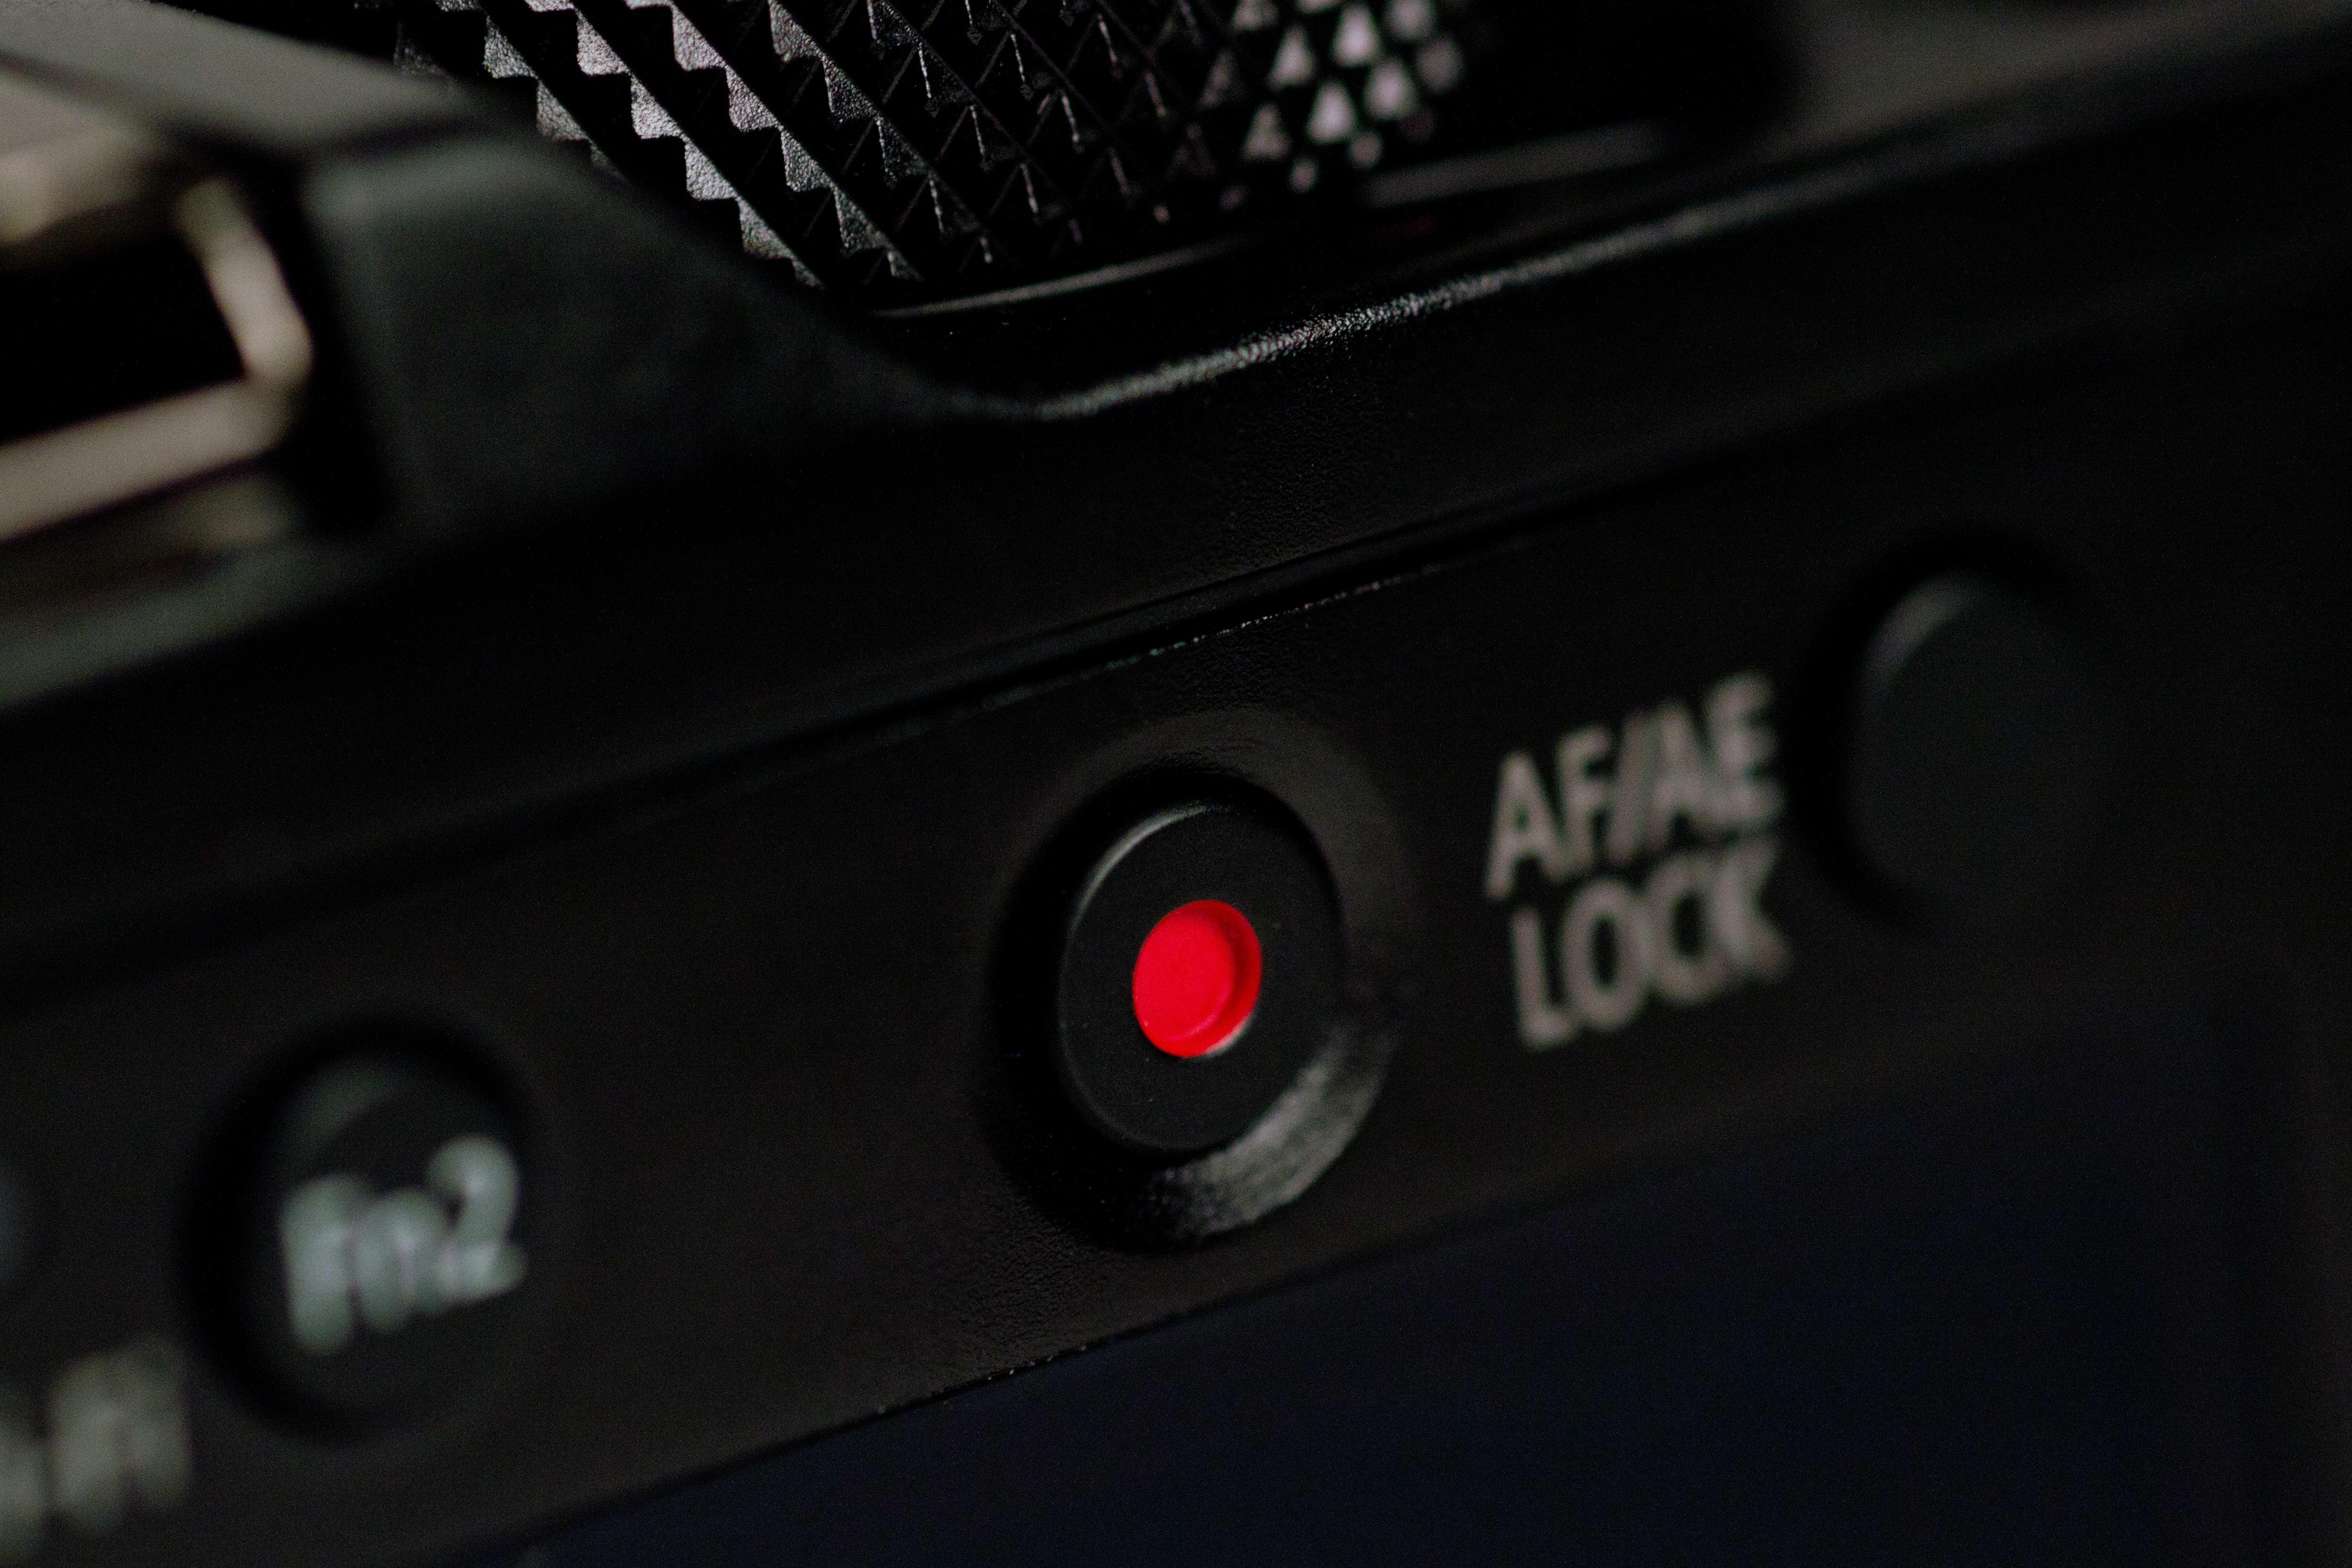 A photograph of the Panasonic Lumix LX100's record button.